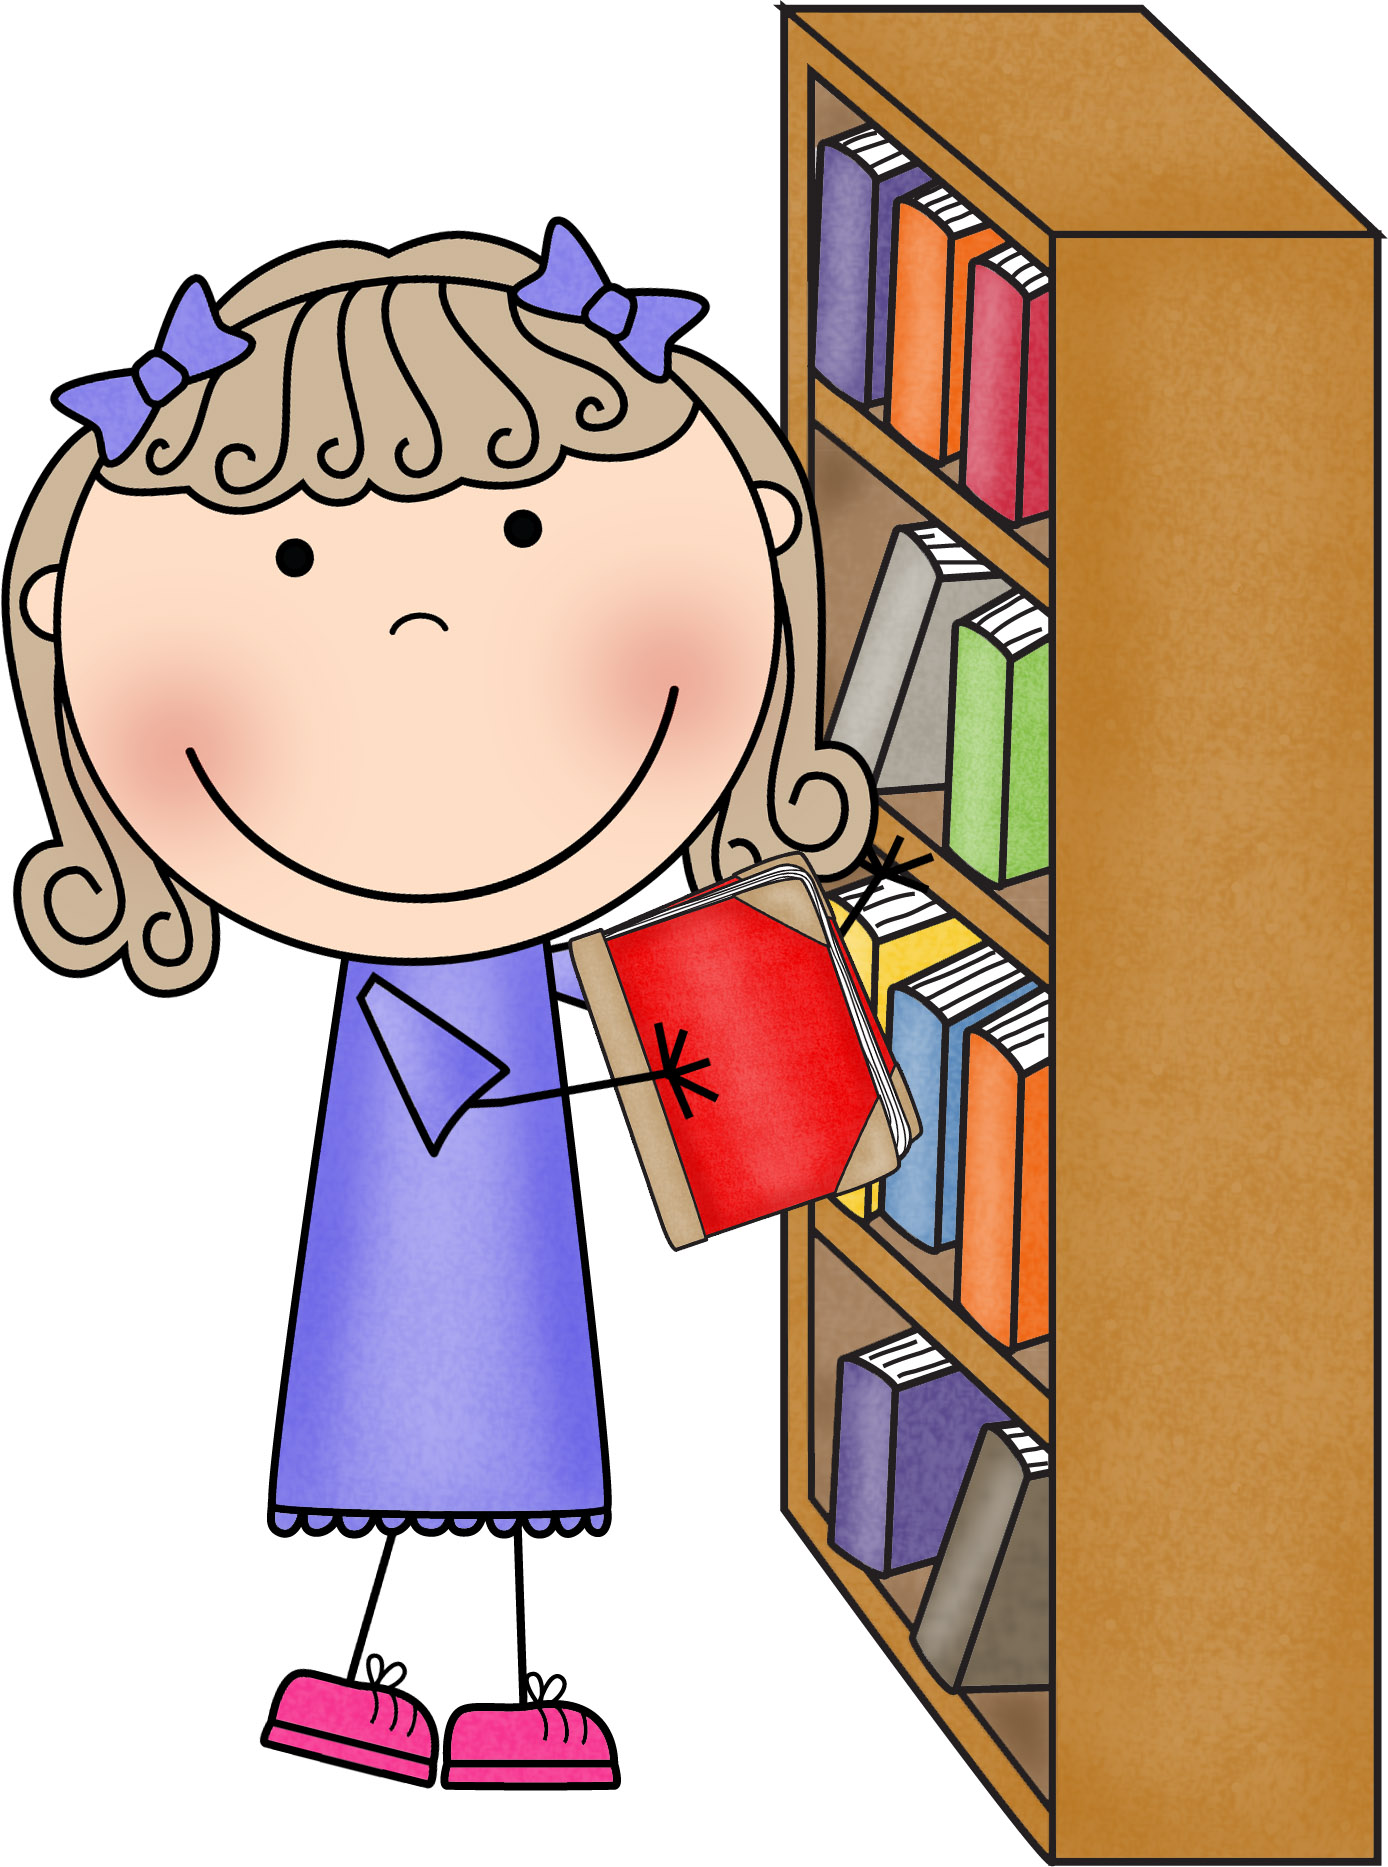 Librariam clipart clip library Librarian Picture | Free download best Librarian Picture on ... clip library